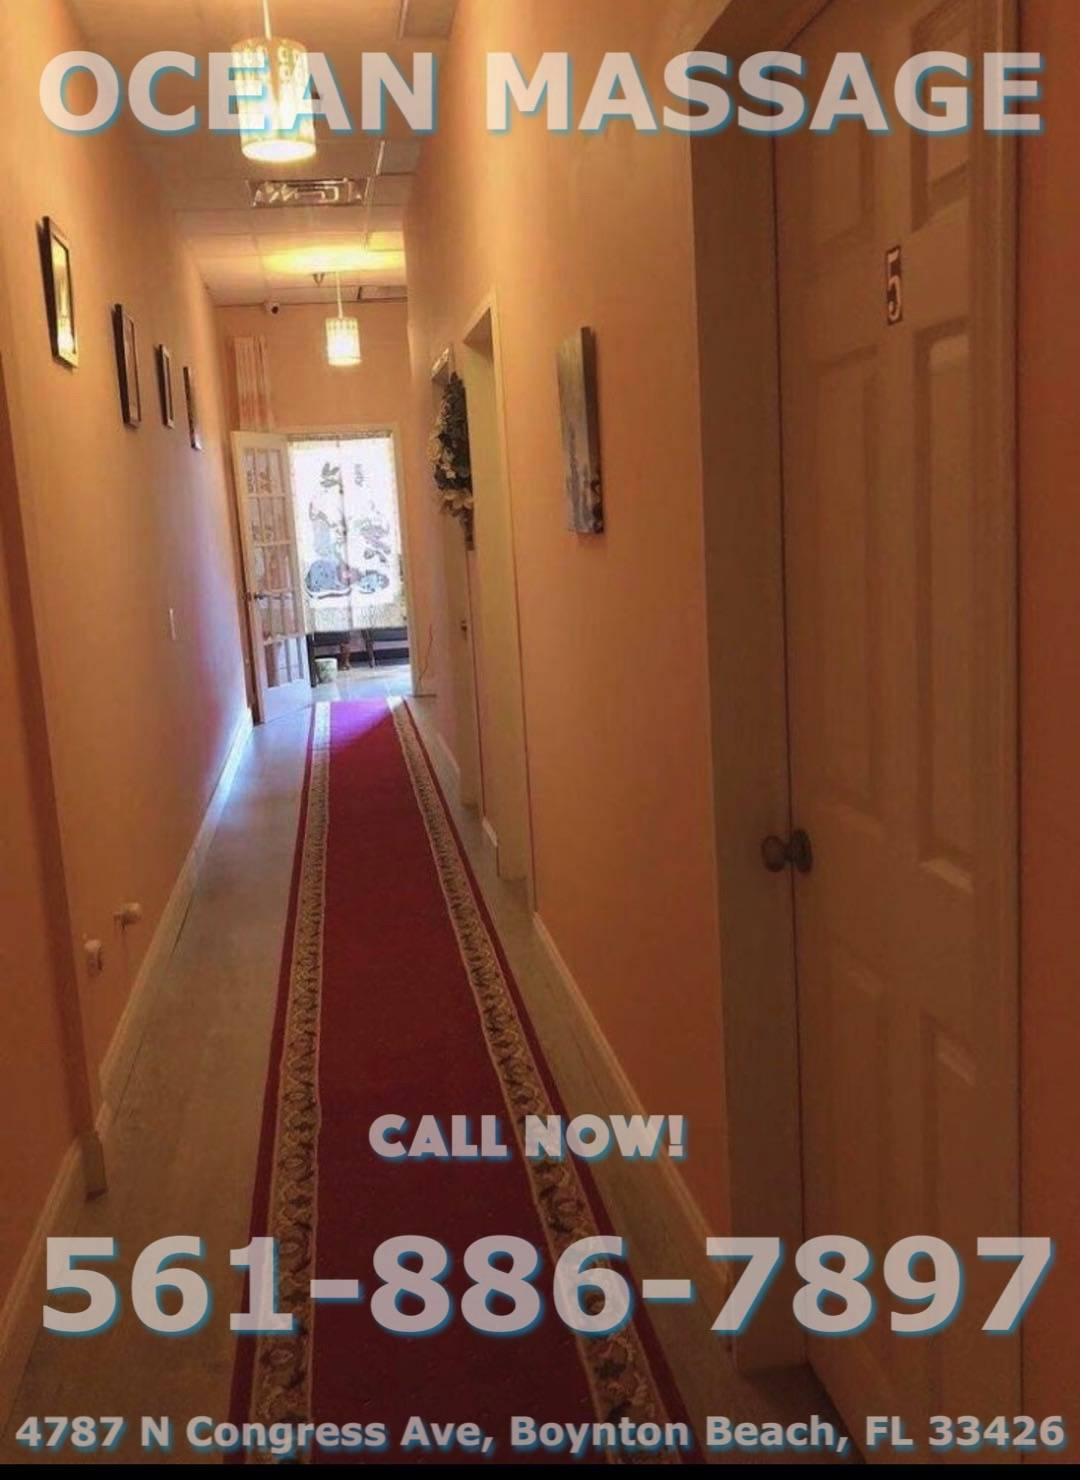 Ocean Massage - spa  | Photo 2 of 4 | Address: 4787 N Congress Ave, Boynton Beach, FL 33426, United States | Phone: (561) 886-7897